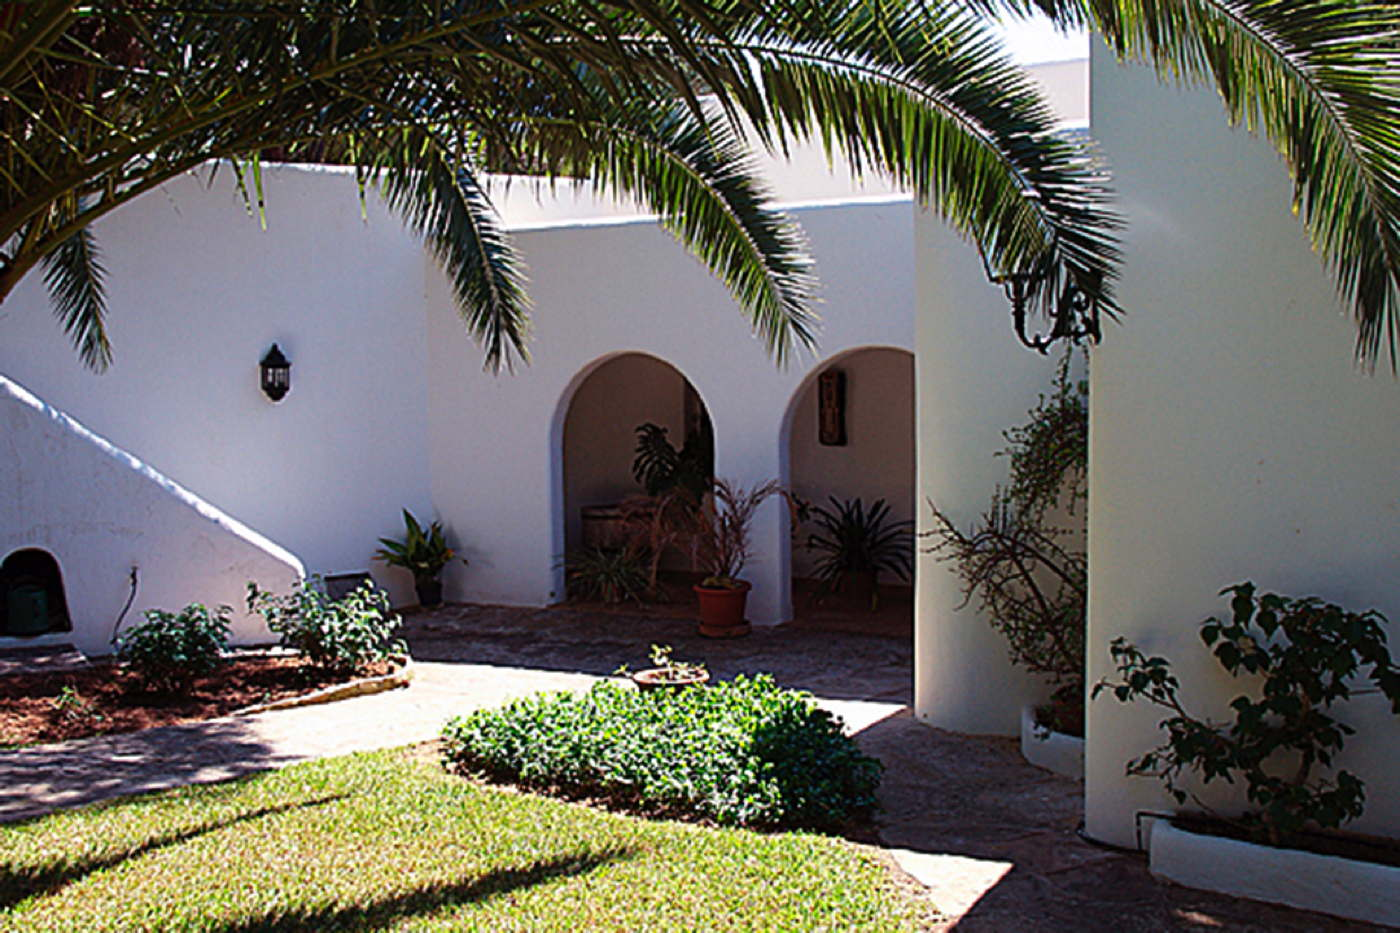 Villa Mondrago